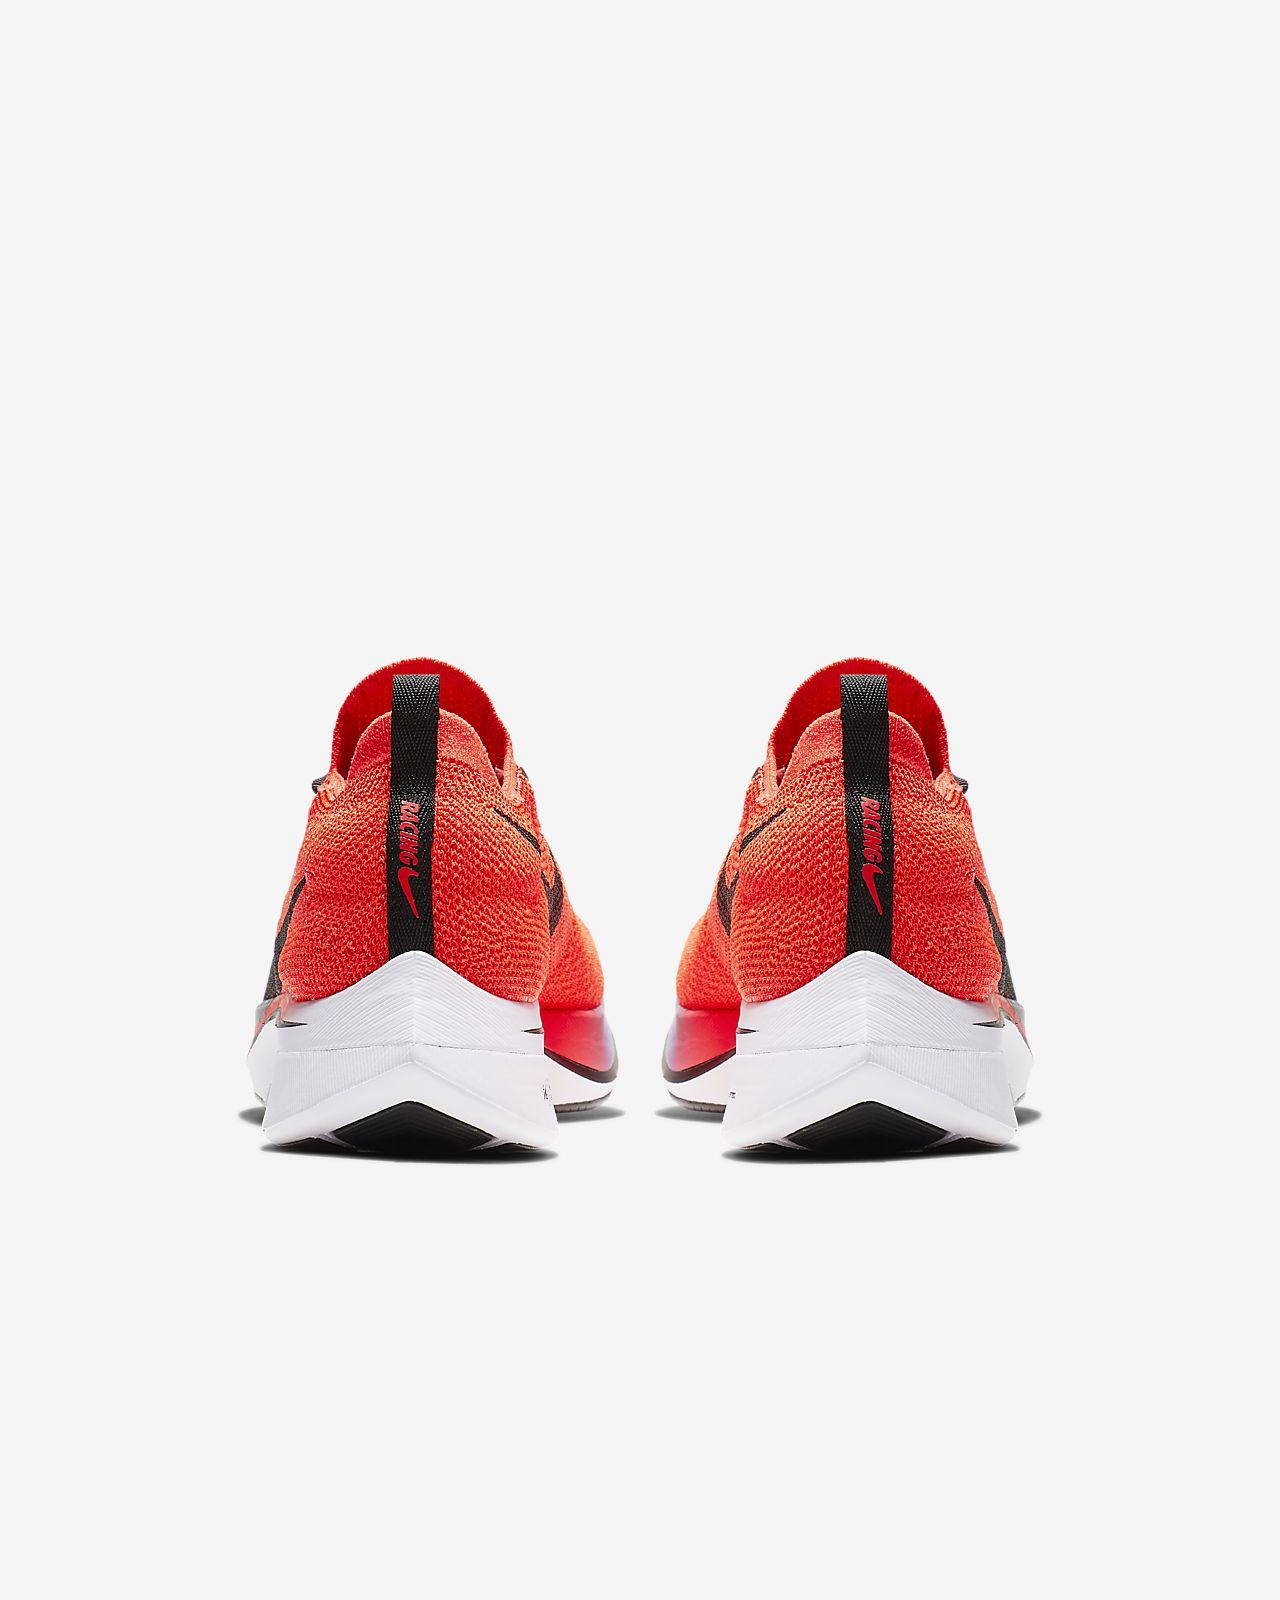 Nike Chaussure De Running Vaporfly 4Flyknit 6gyI7fYbv